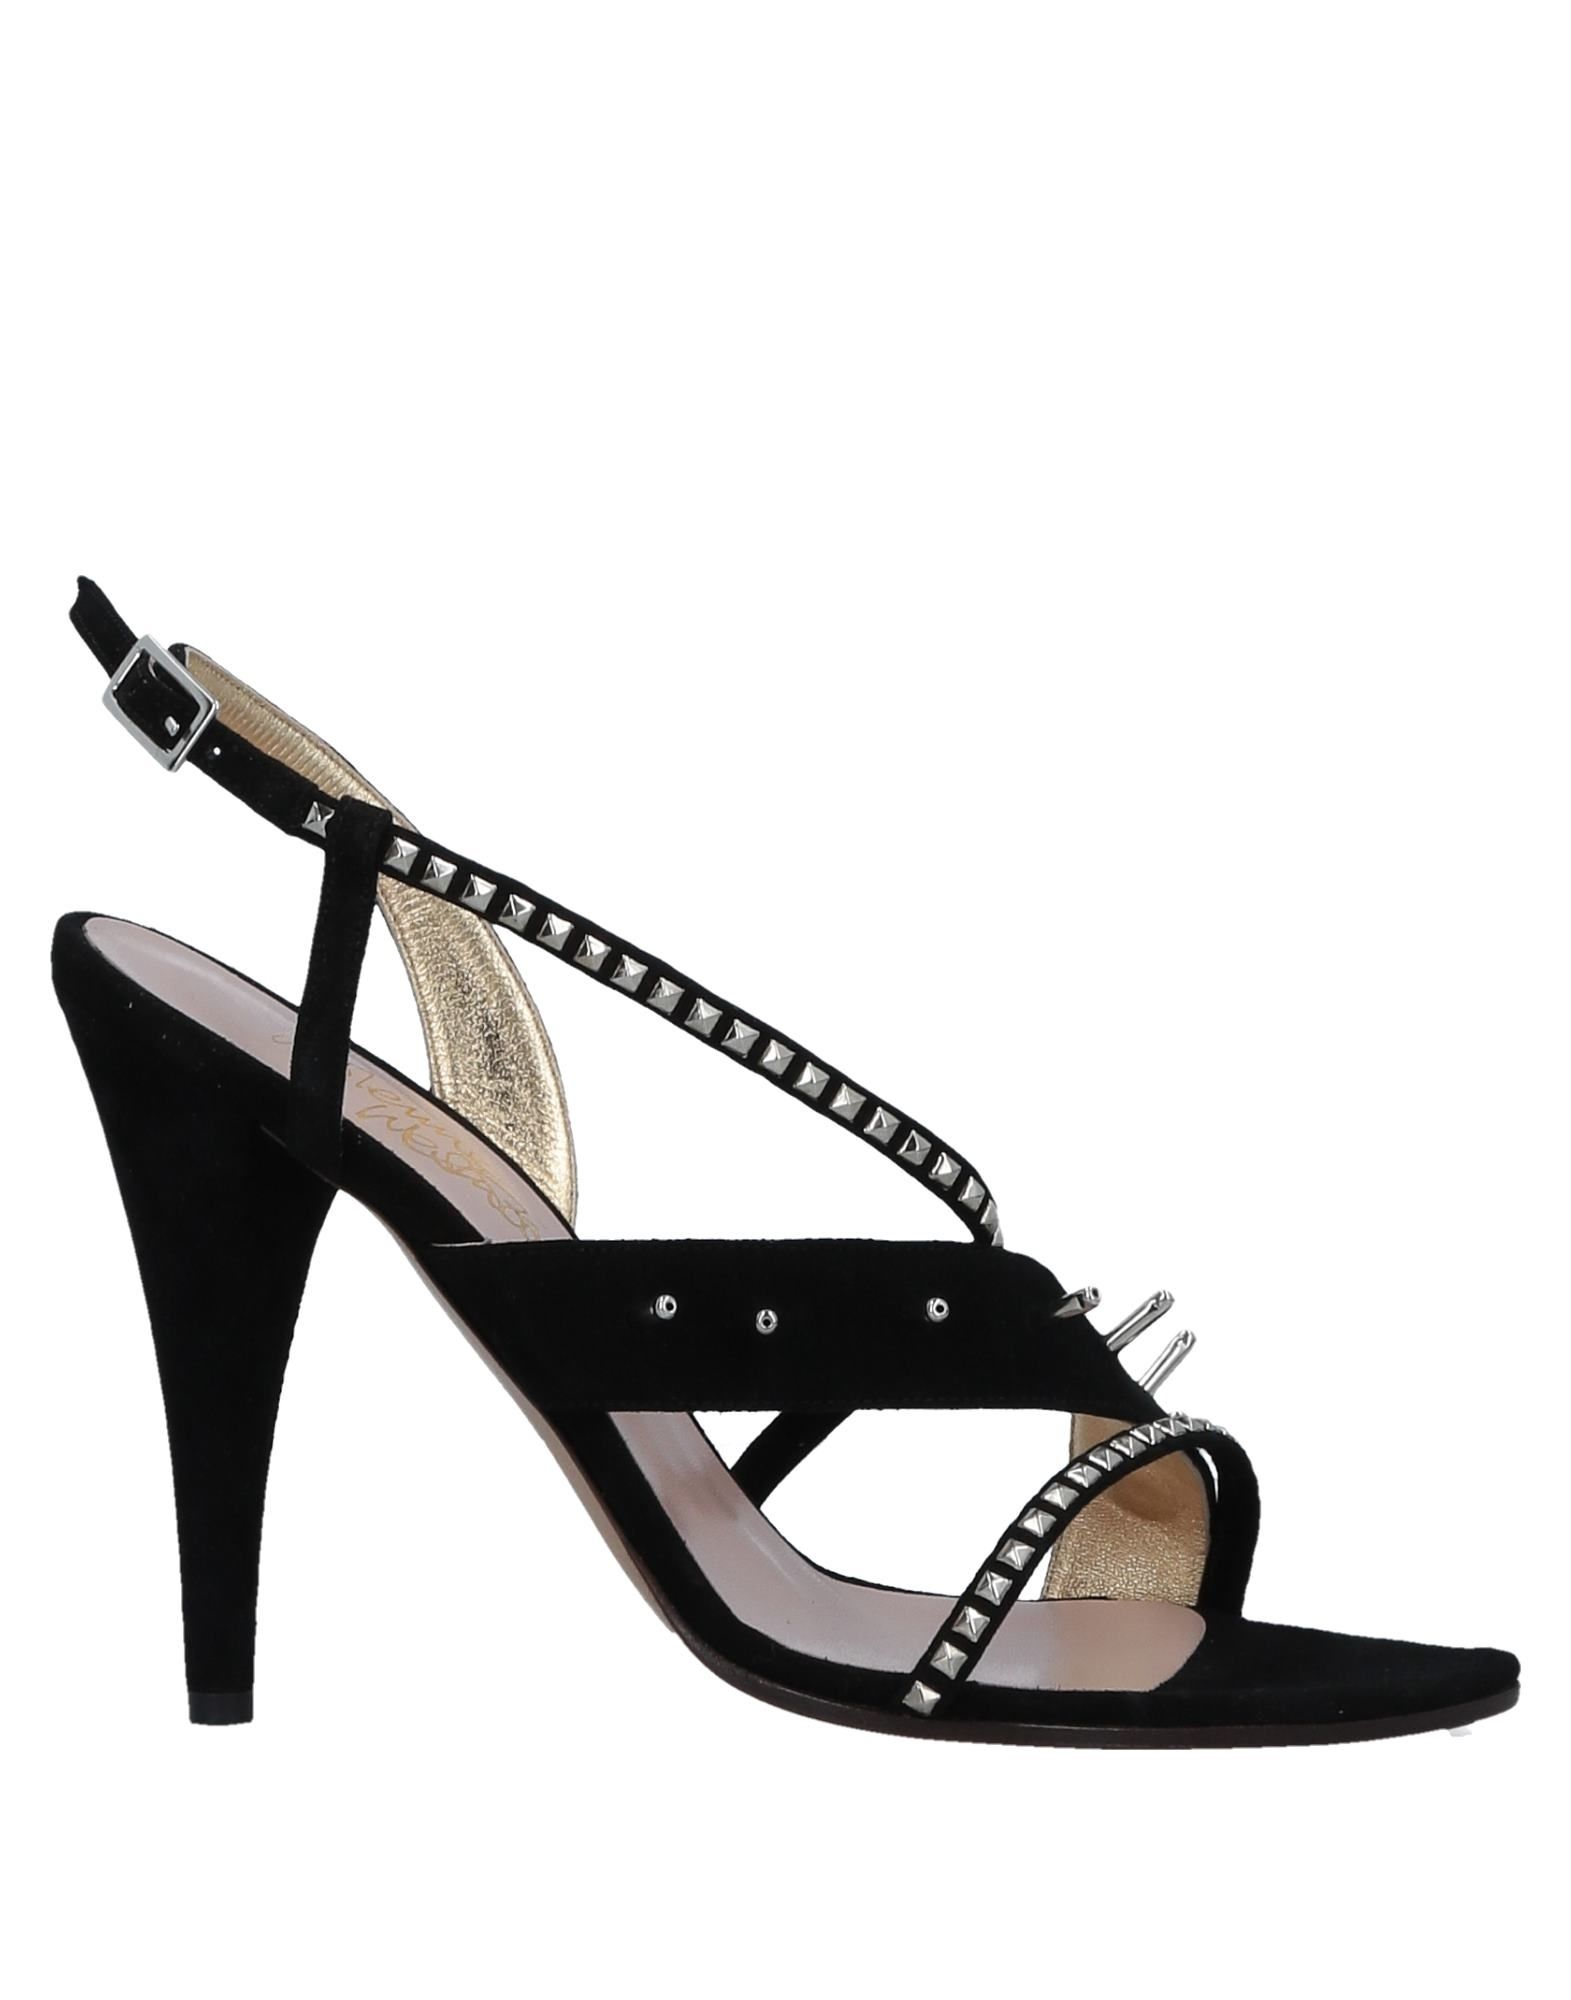 Vivienne Vivienne Westwood Sandals - Women Vivienne Vivienne Westwood Sandals online on  United Kingdom - 11517397RF 168679